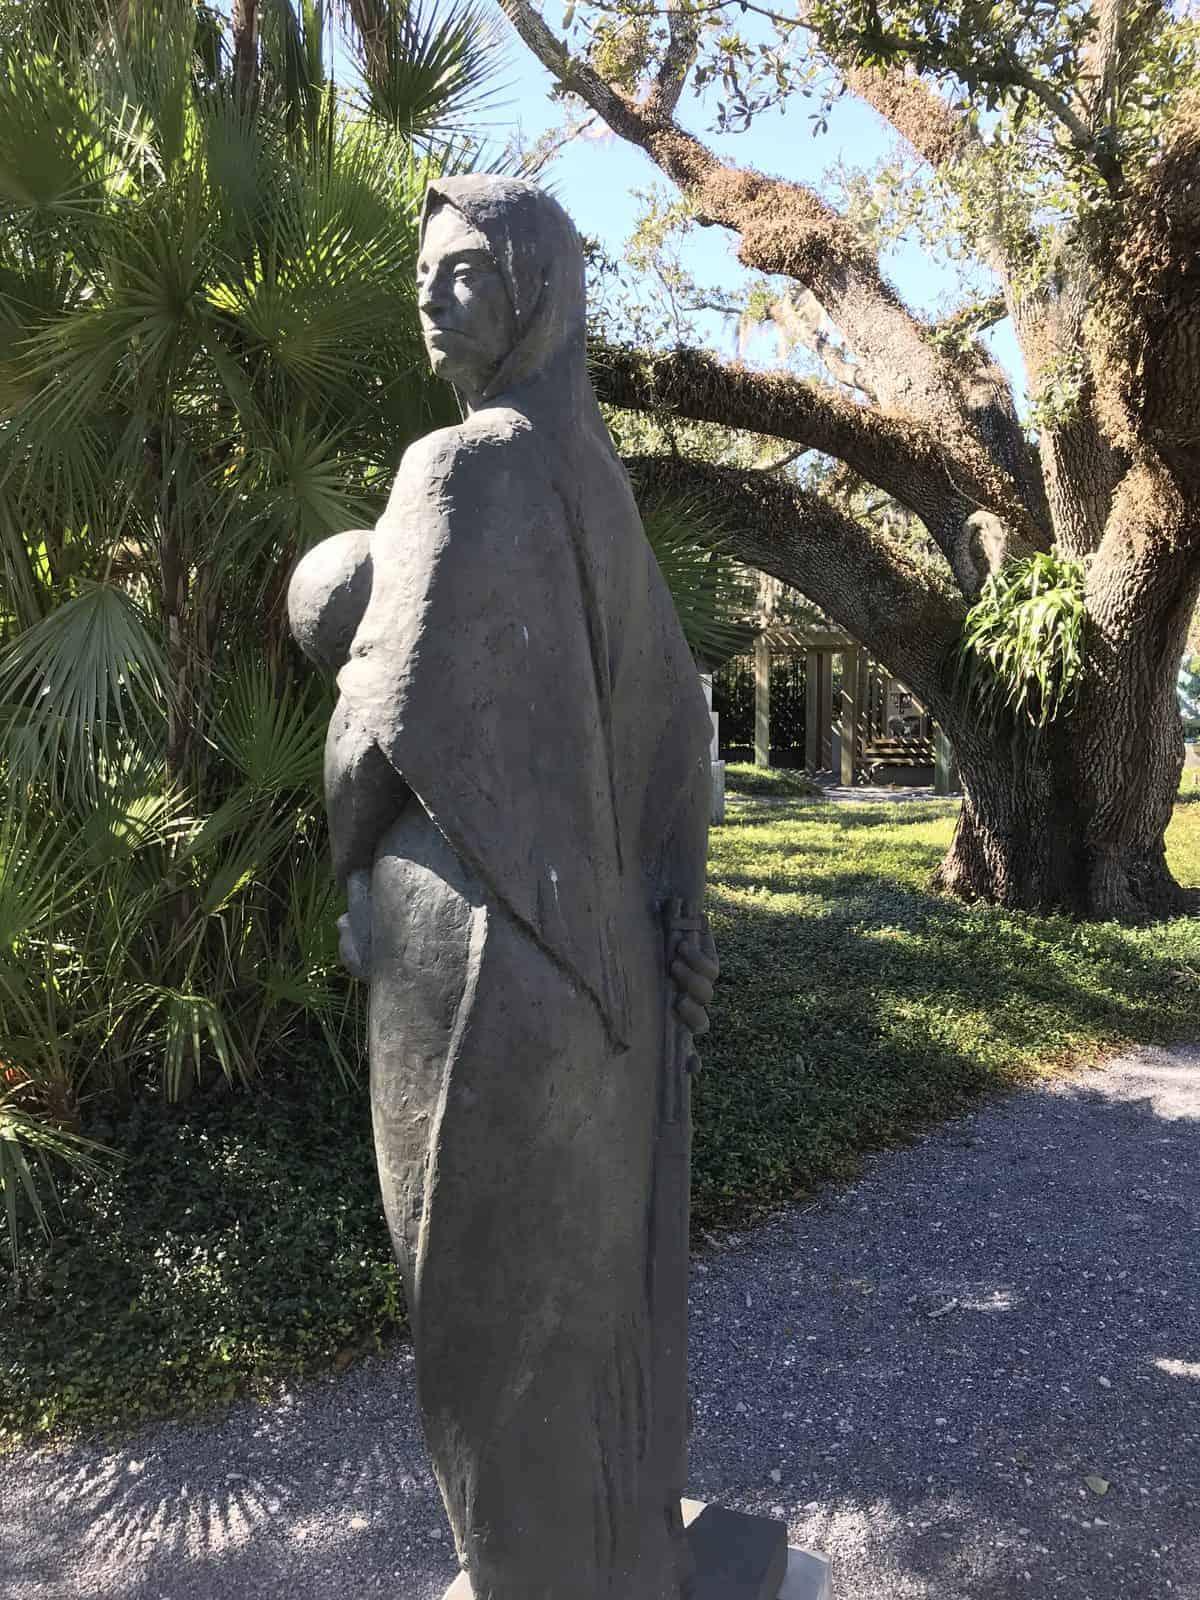 Sculpture in The Helis Foundation Enrique Alférez Sculpture Garden New Orleans Botanical Garden - AAS Display Garden